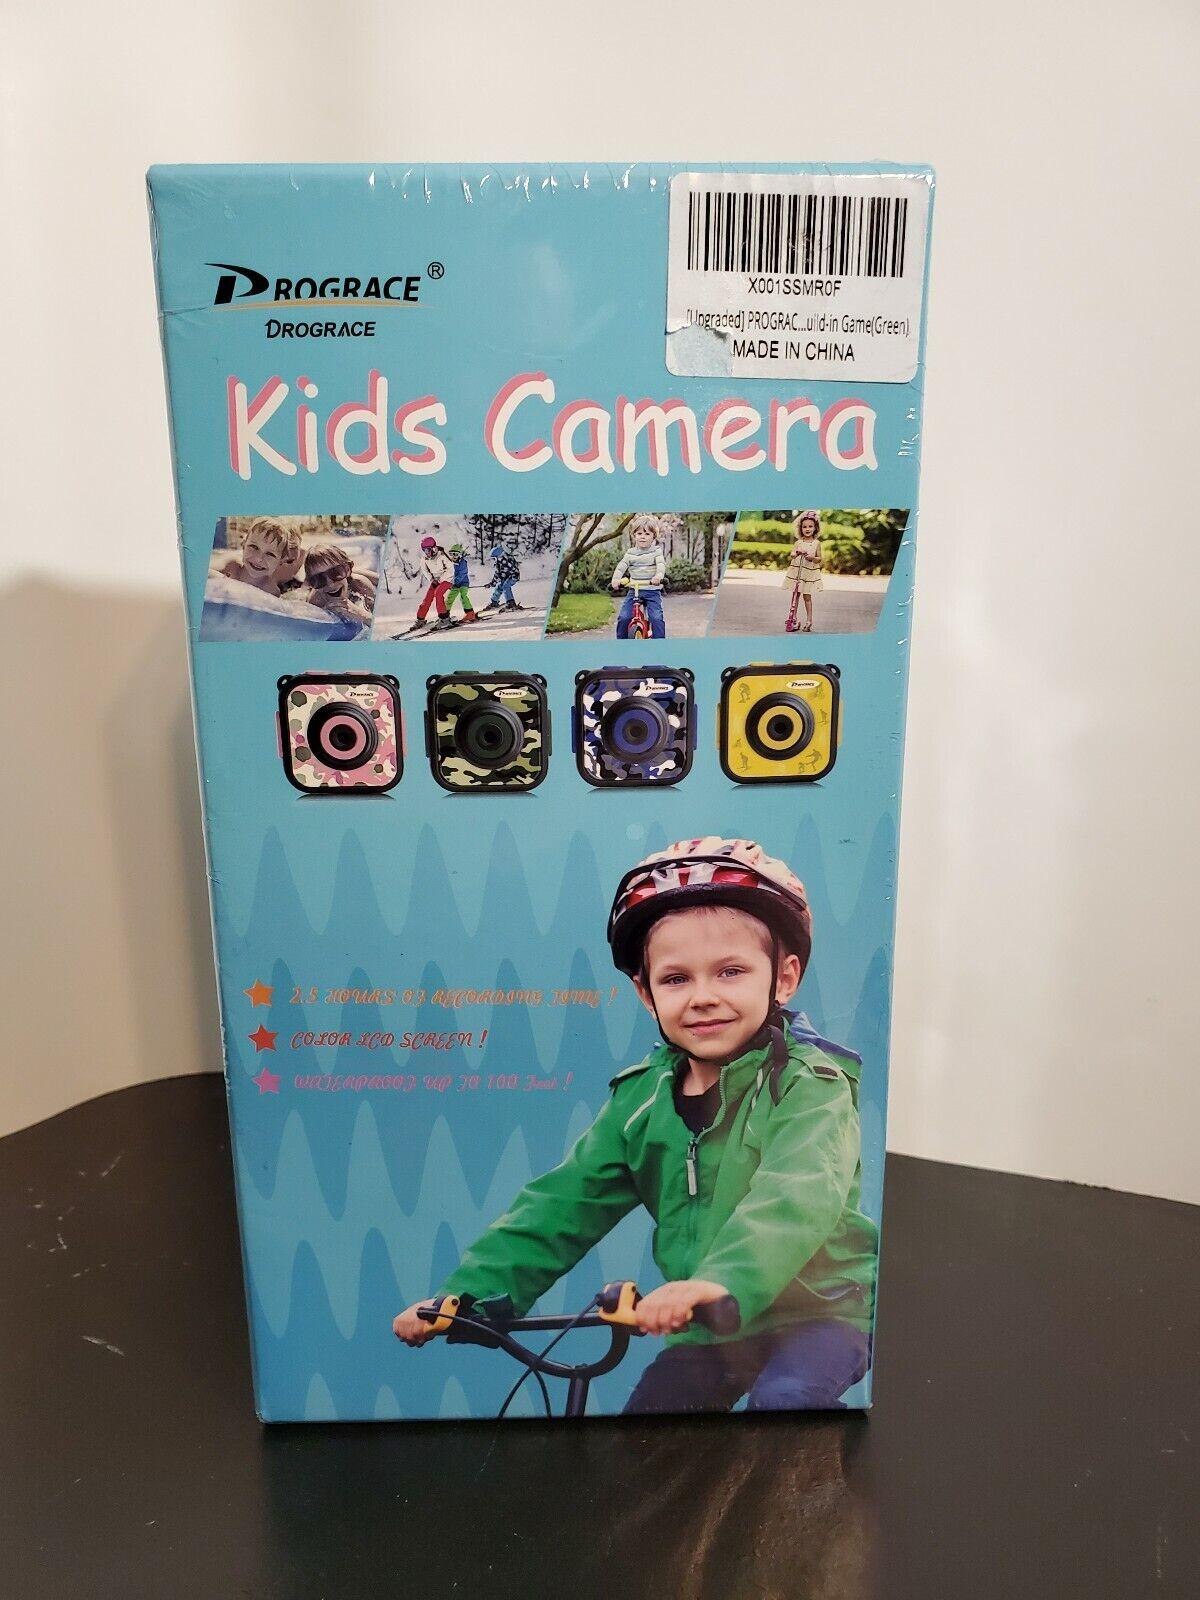 PROGRACE Children Kids Camera Waterproof Digital Video HD Action Camera 1080P Sp 1080p action camera children digital kids prograce video waterproof